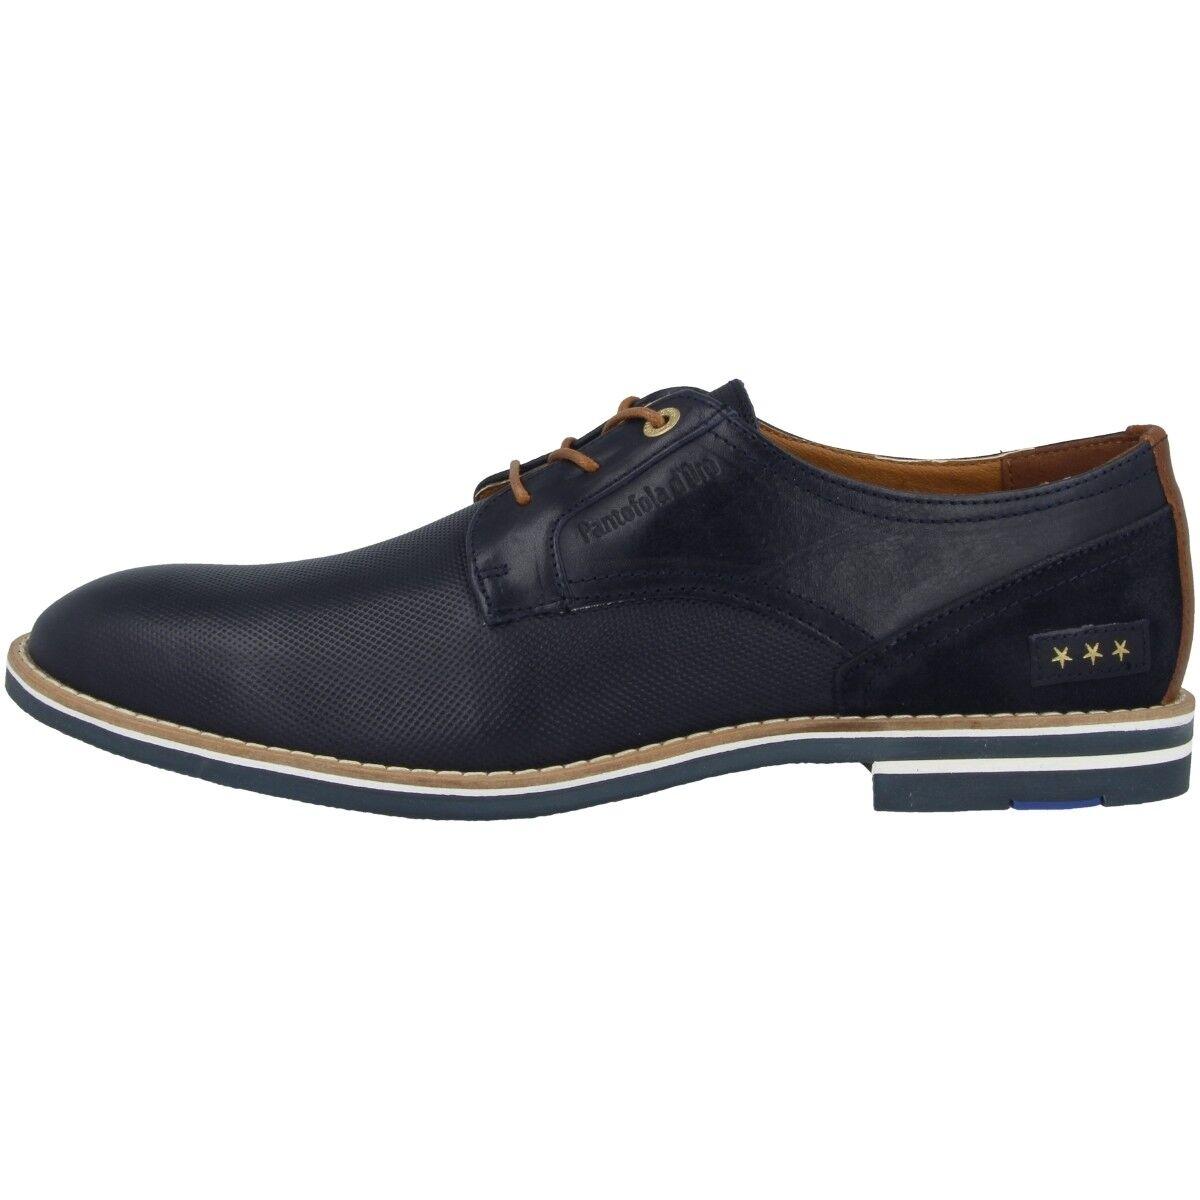 Pantofola D gold Lambro men Low shoes Men's Casual Sneakers 10191001.2